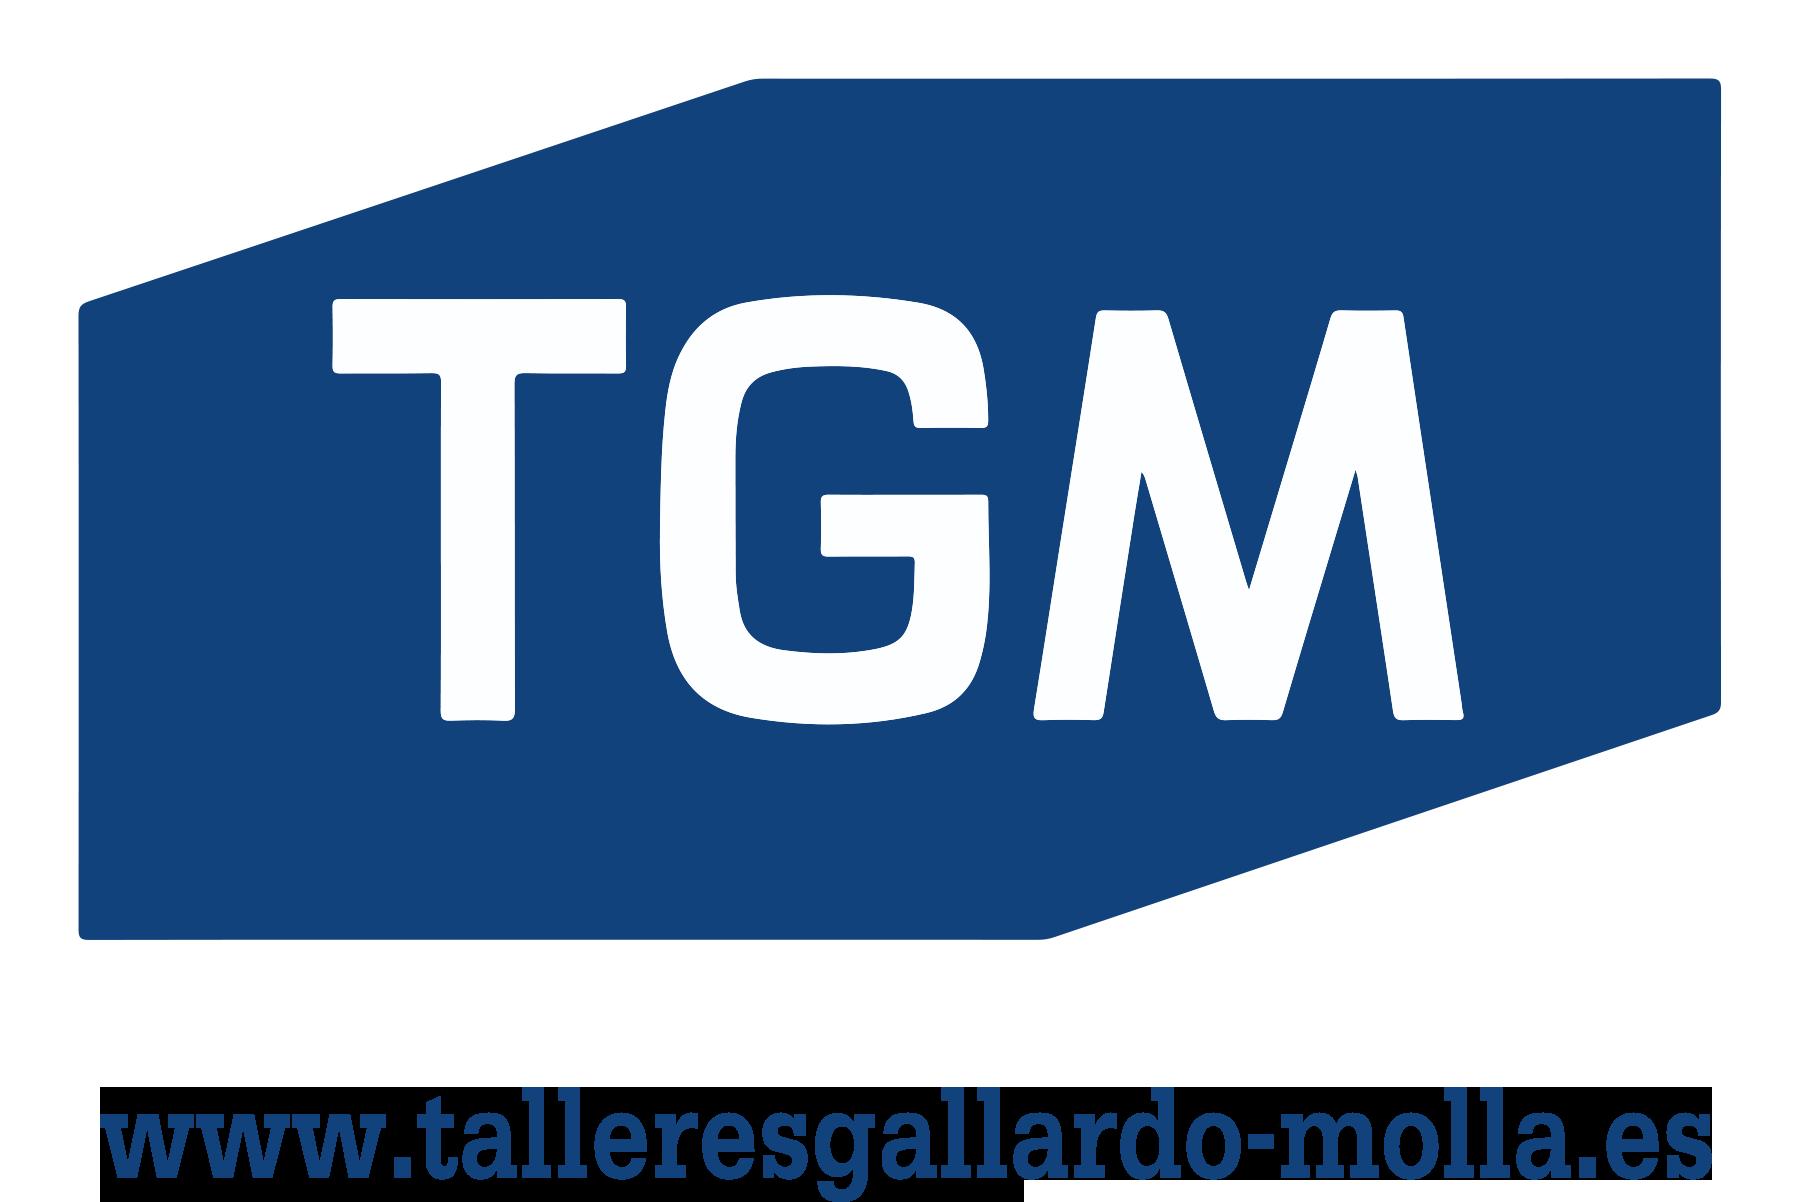 Talleres Gallardo Mollà S.L.